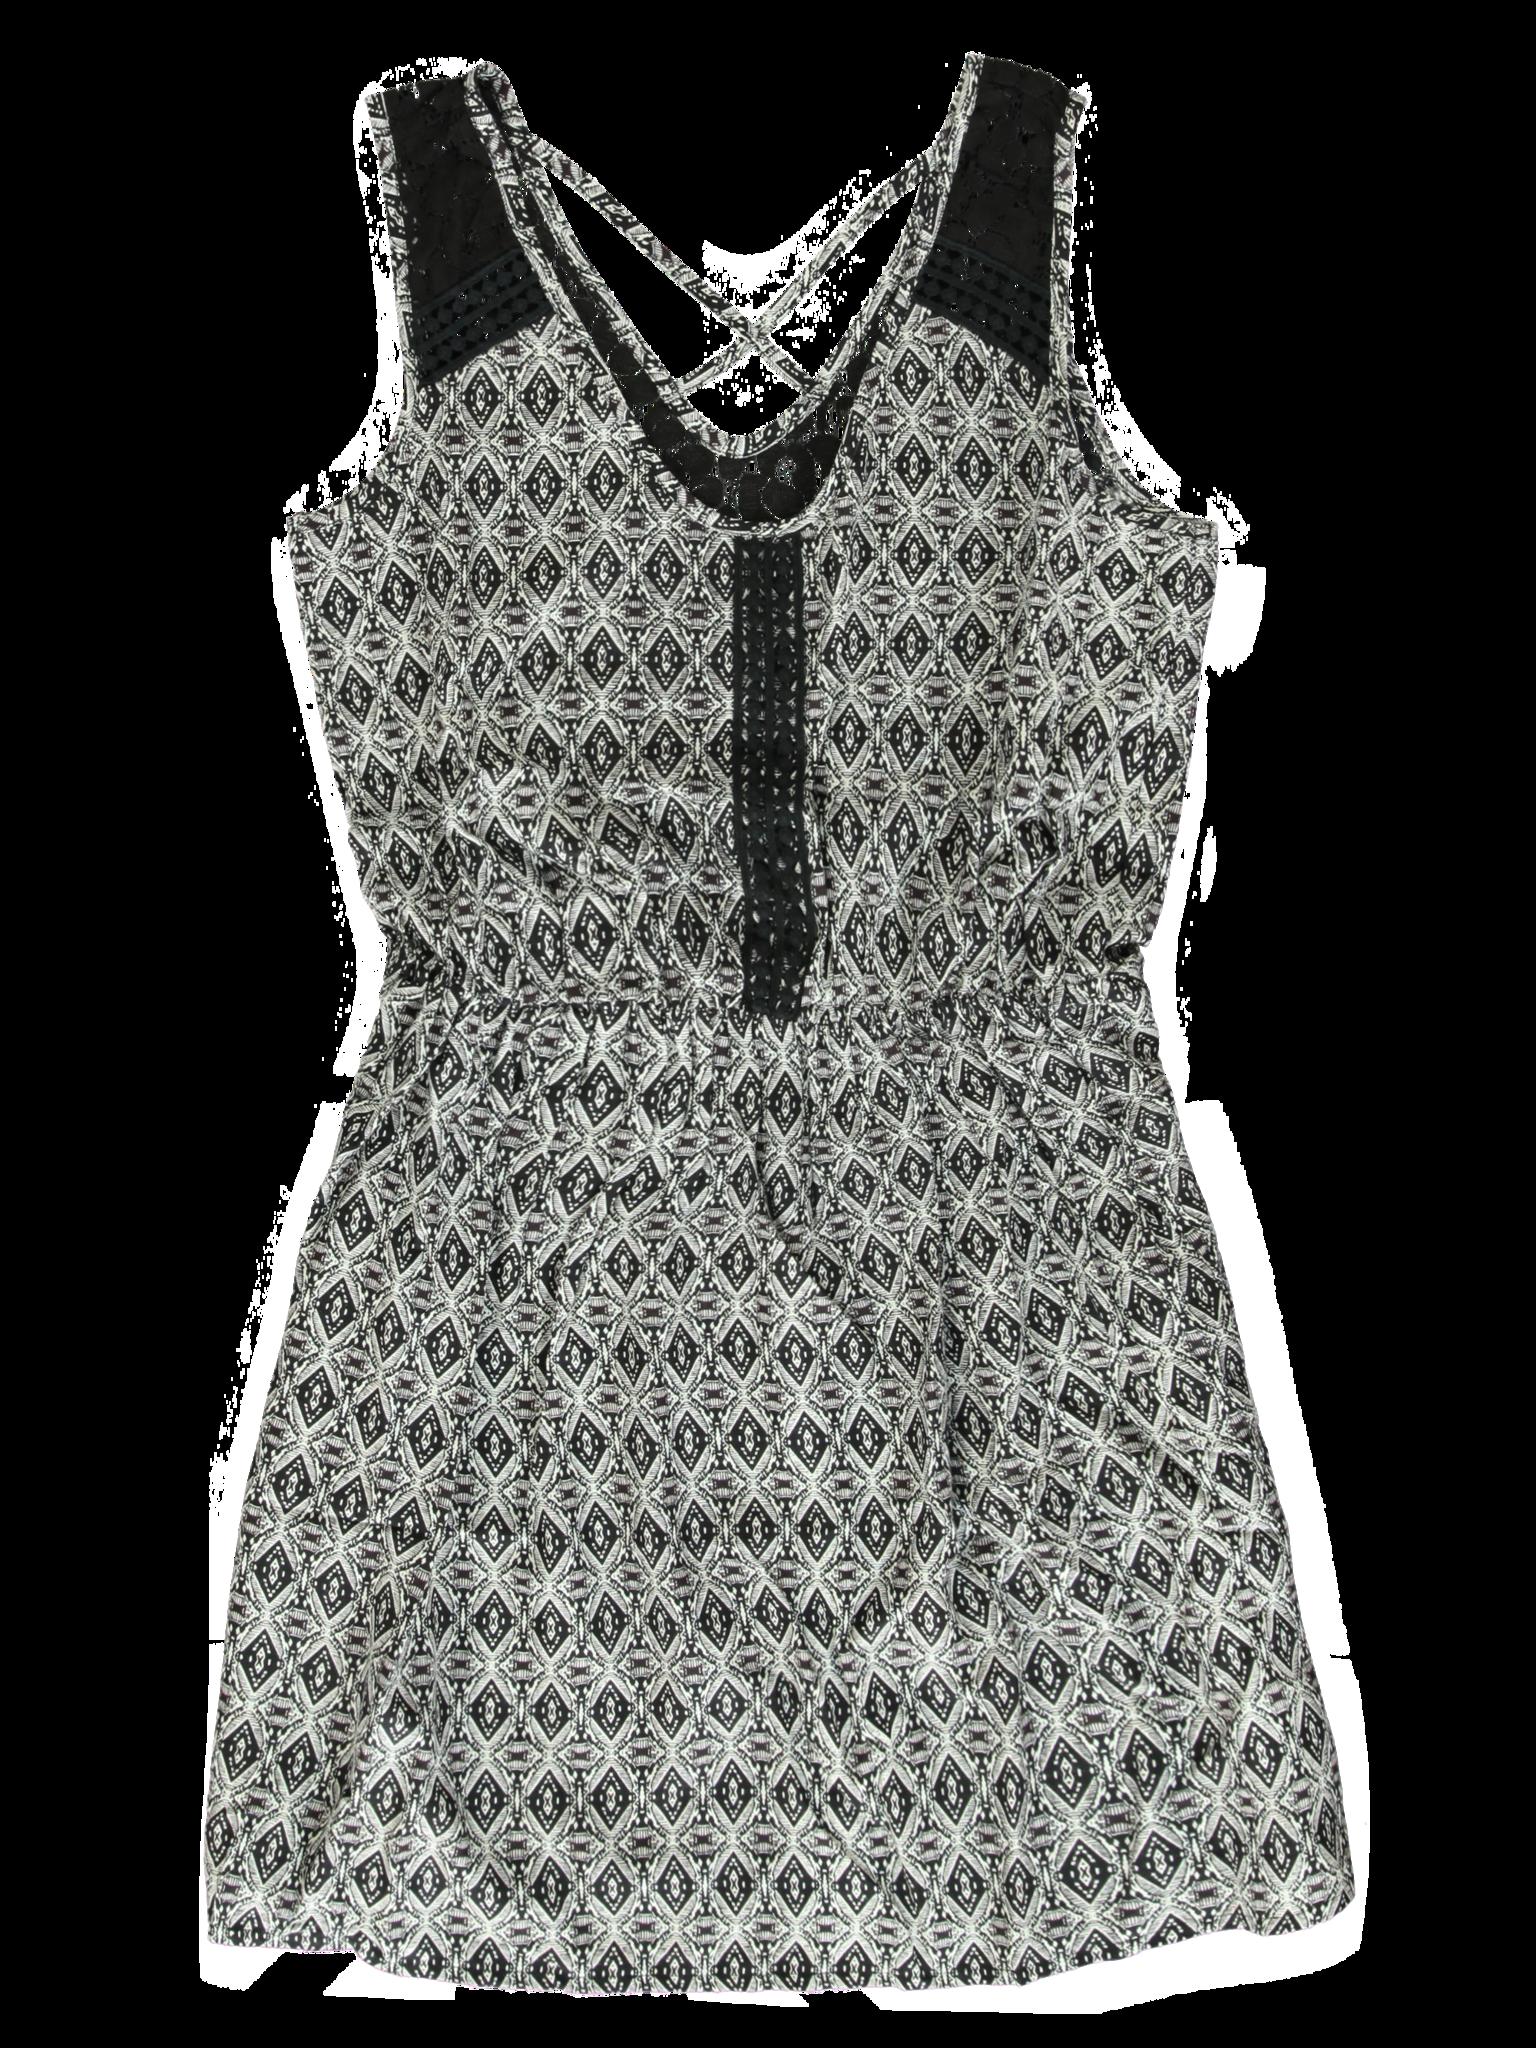 All Brands | Summerproducts Ladies | Dress | 18 pcs/box